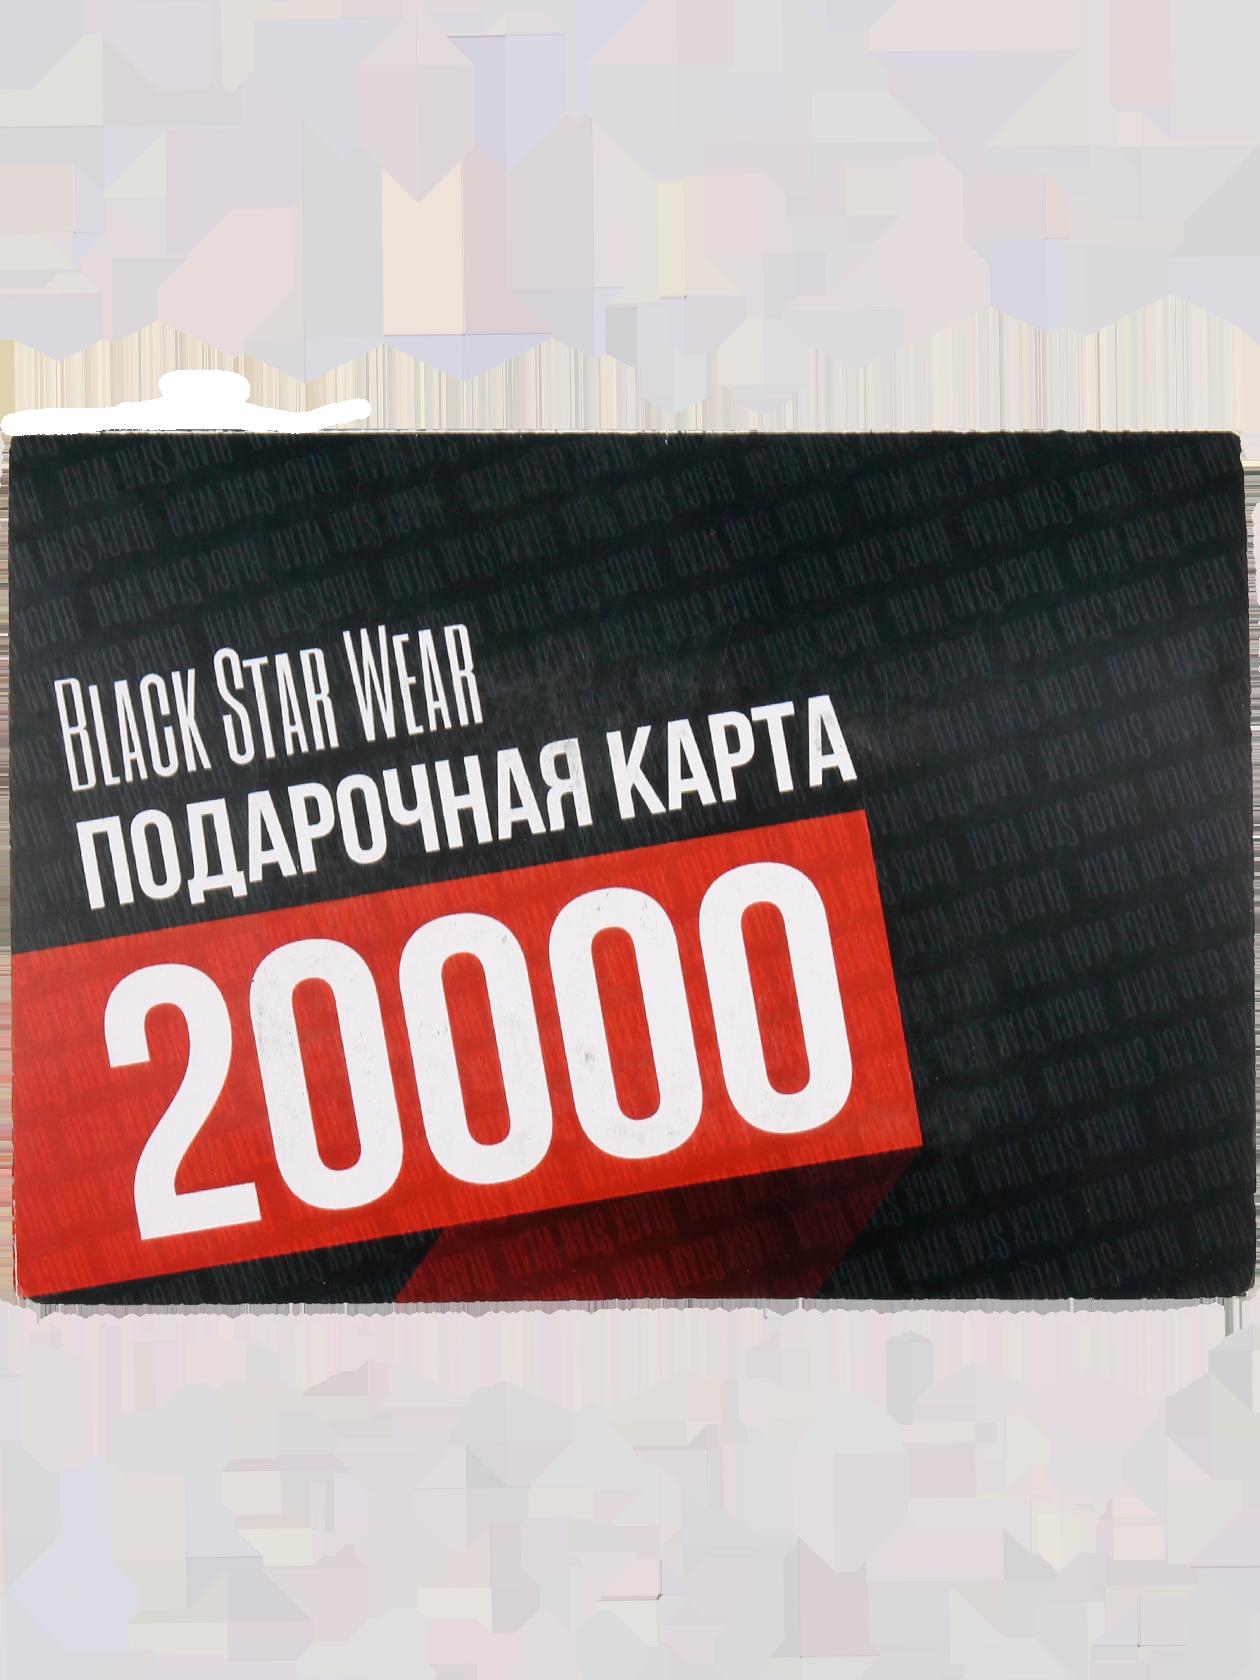 Подарочная карта  20000 рублей от Black Star